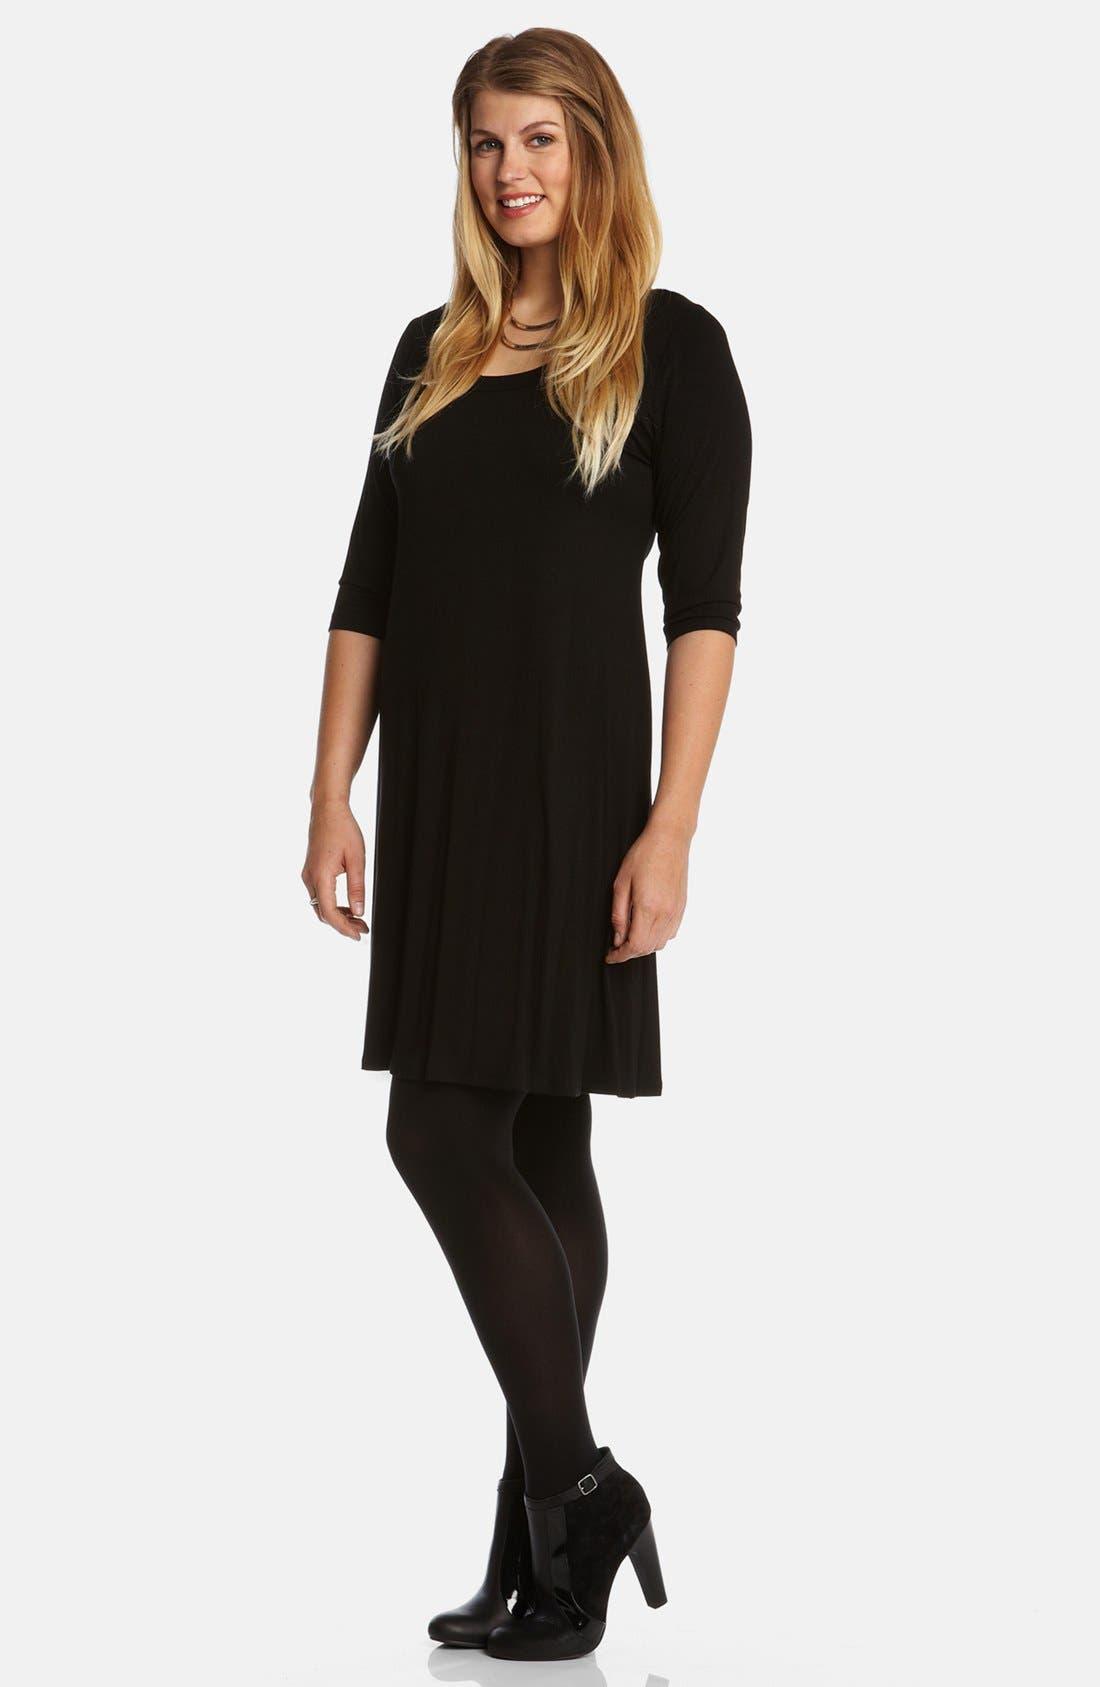 KAREN KANE, Scoop Neck Jersey Dress, Alternate thumbnail 2, color, BLACK